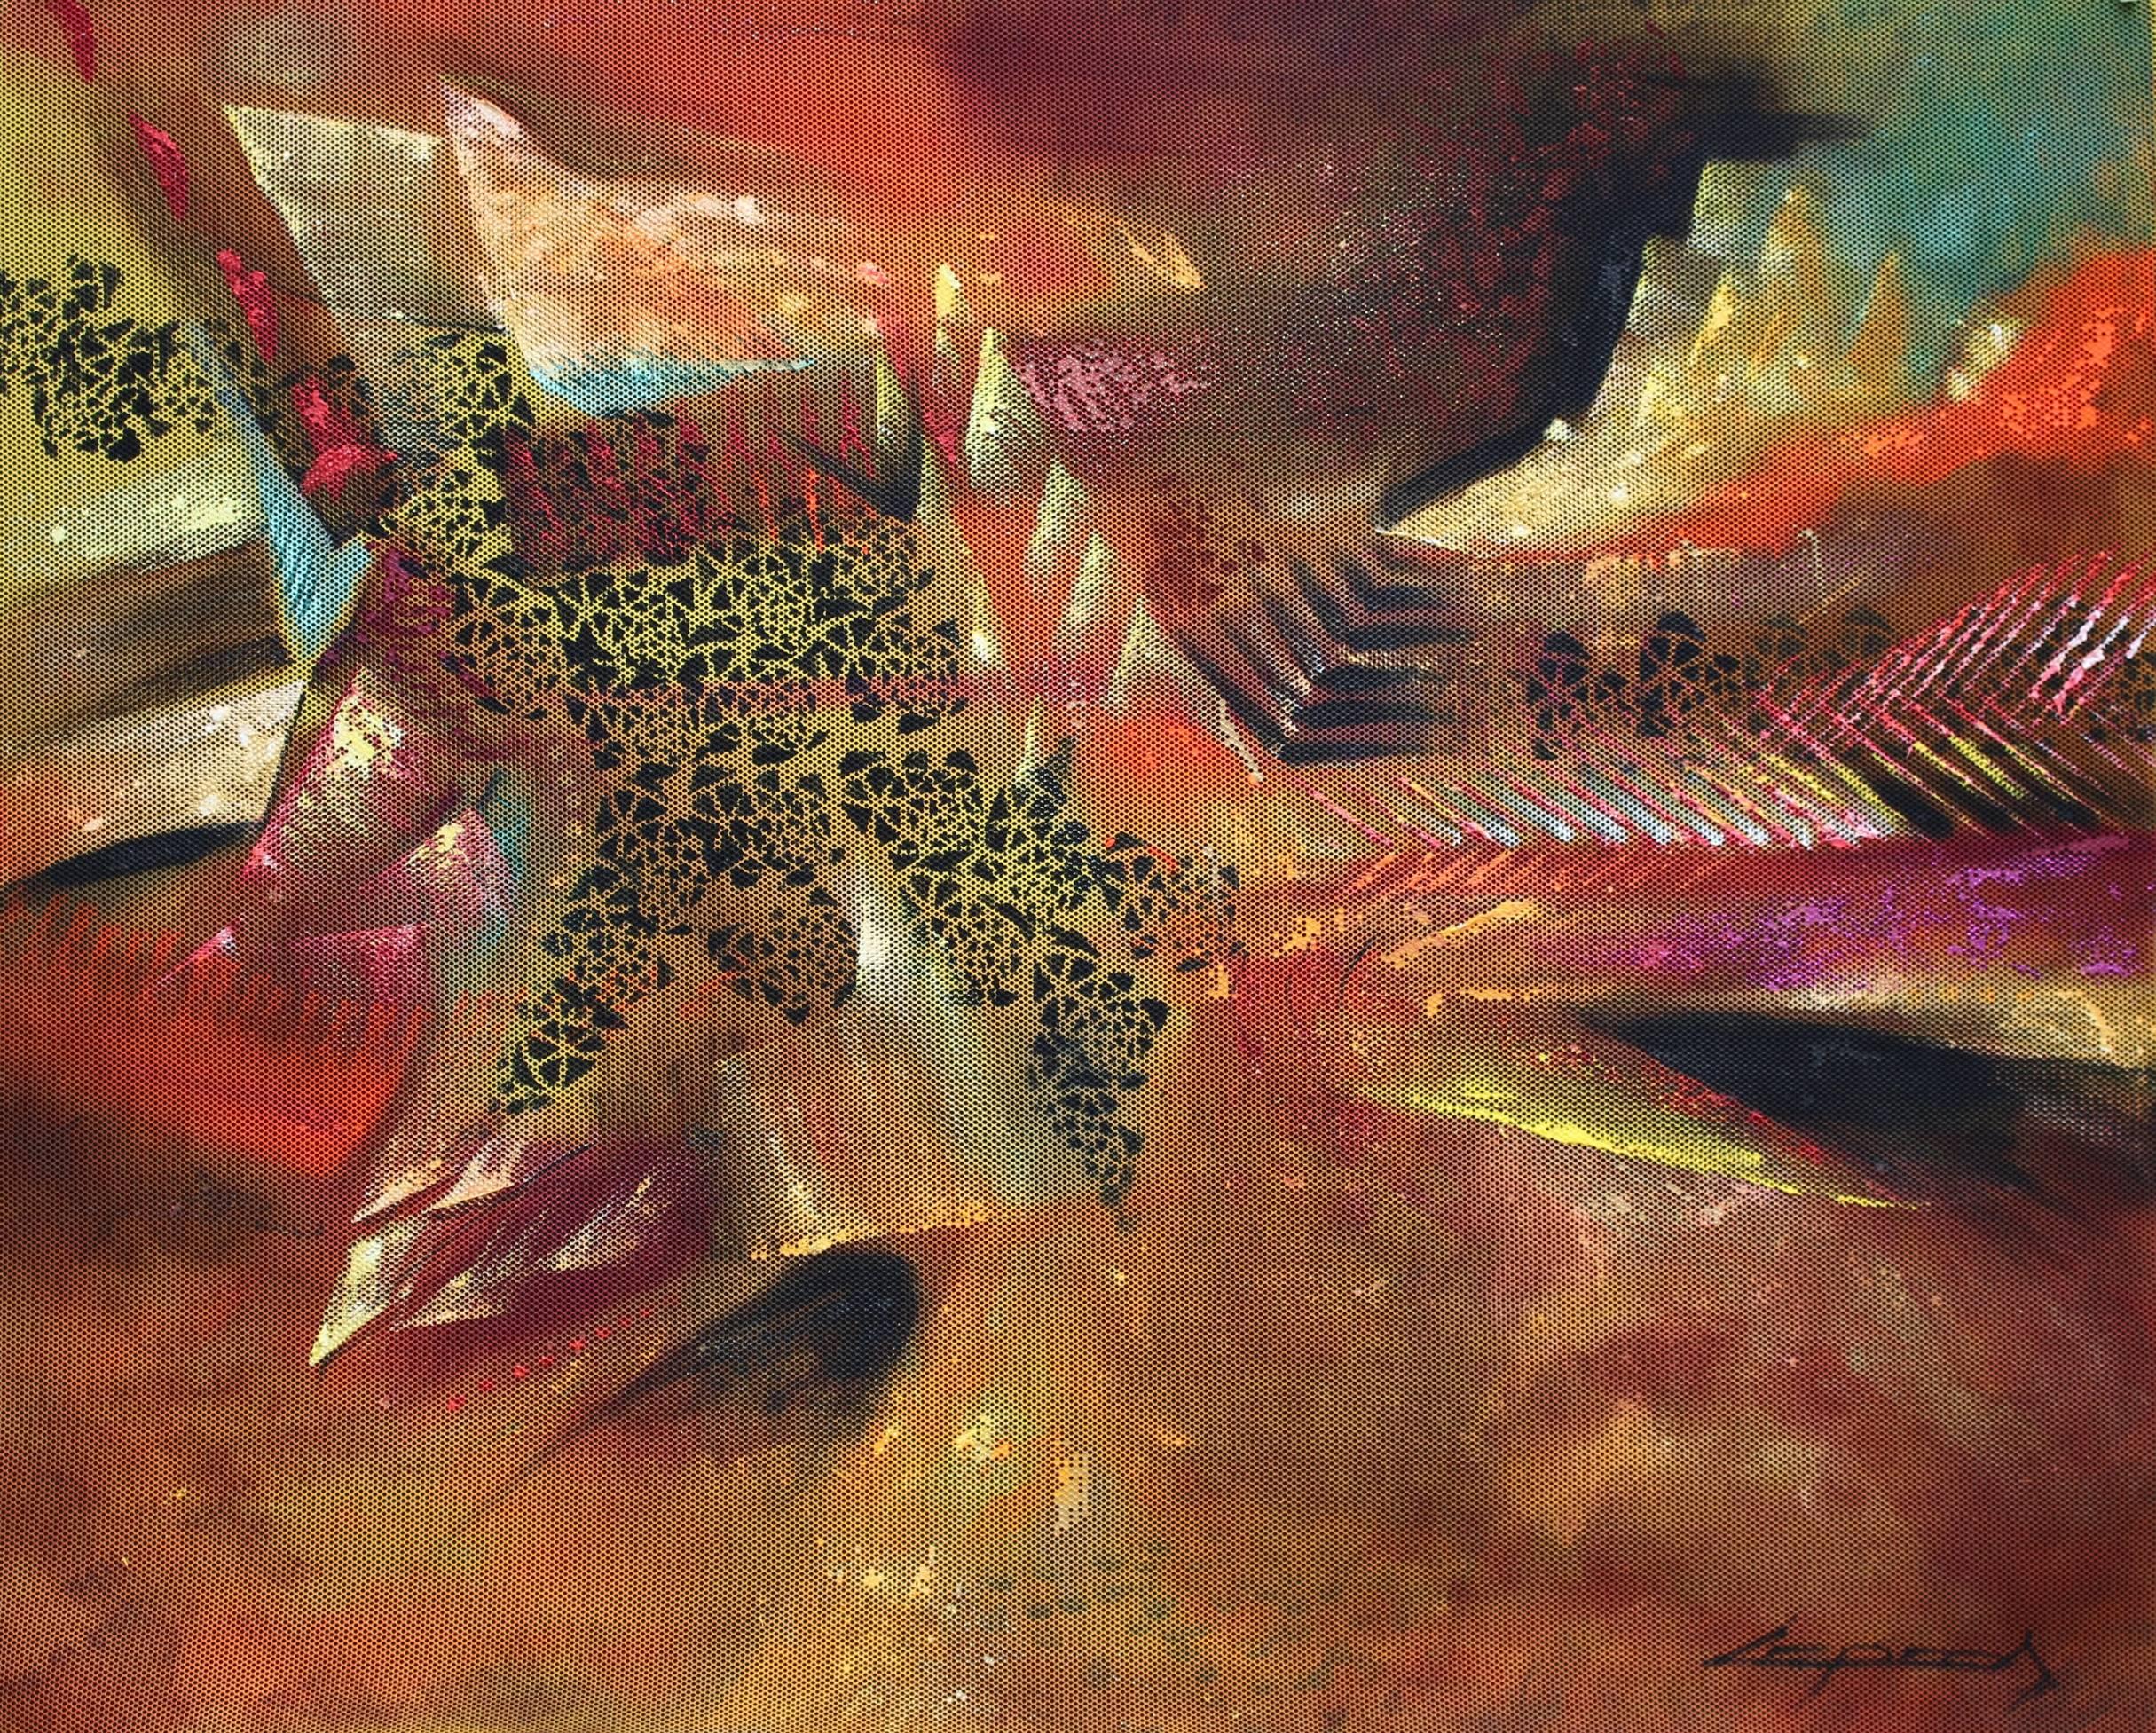 Agua sagrada - ritual ancestra (2014) - Carlos Cepeda